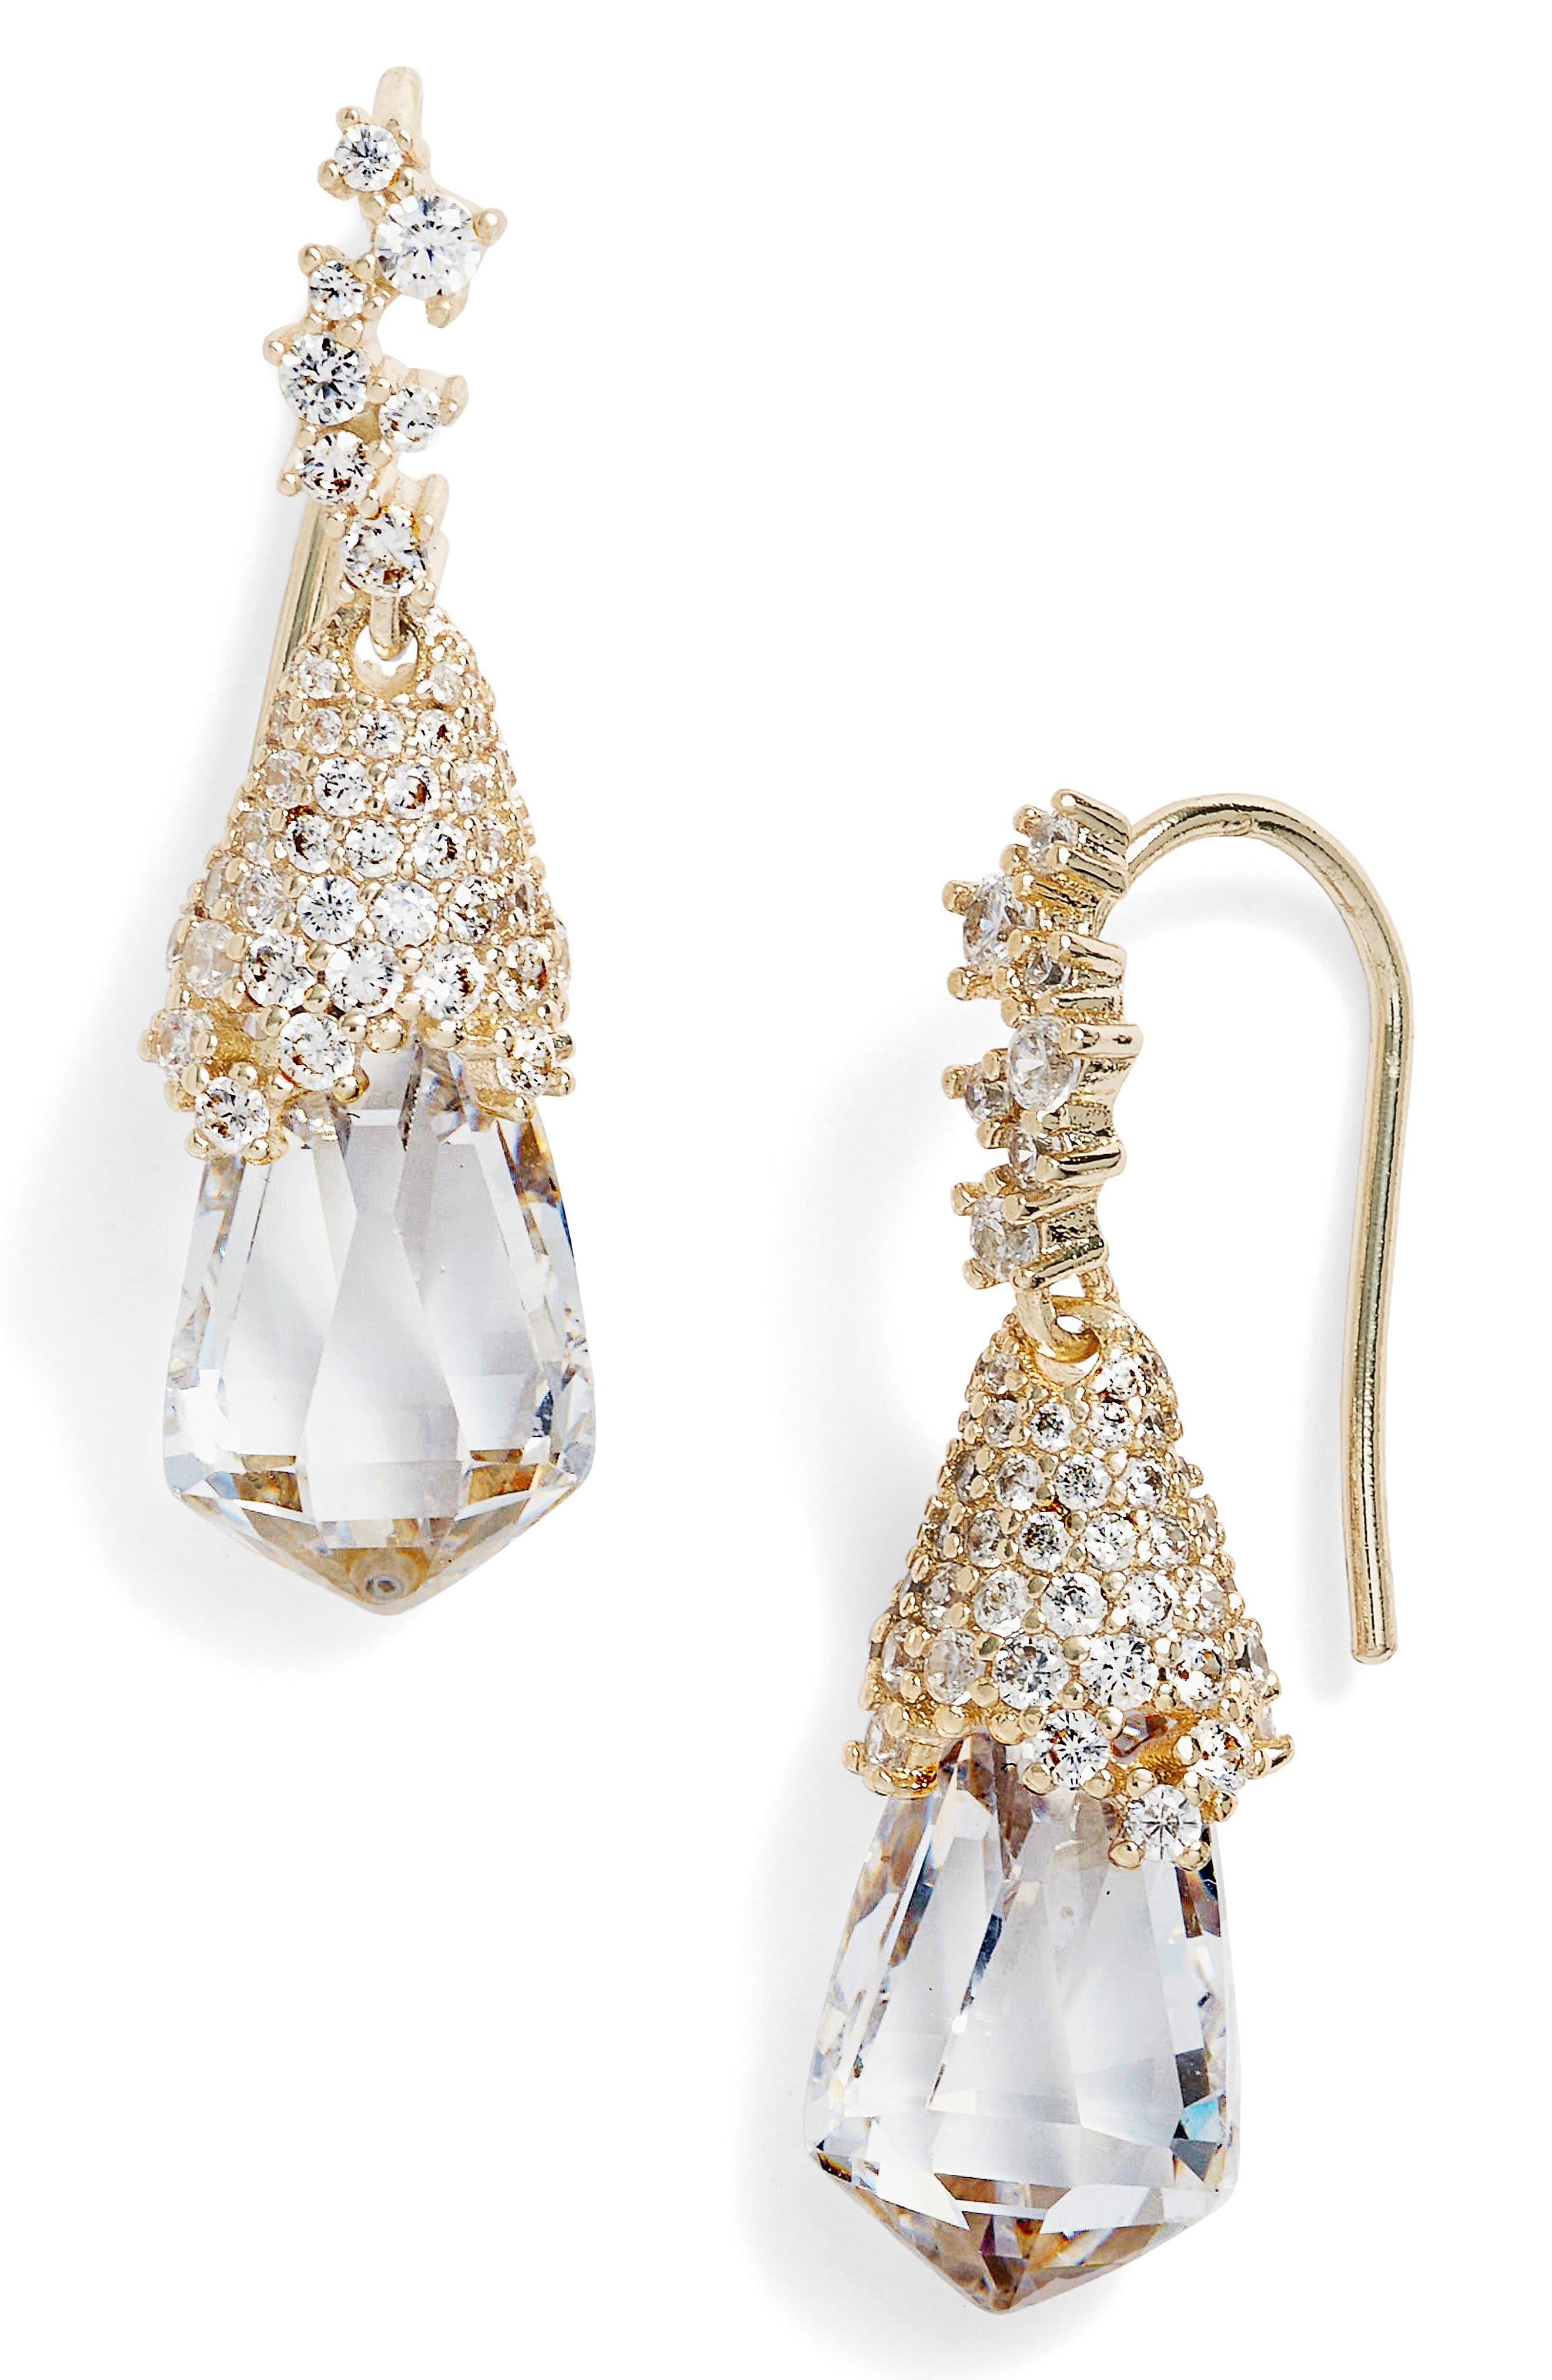 Becky Teardrop Earrings,                             Main thumbnail 1, color,                             Gold